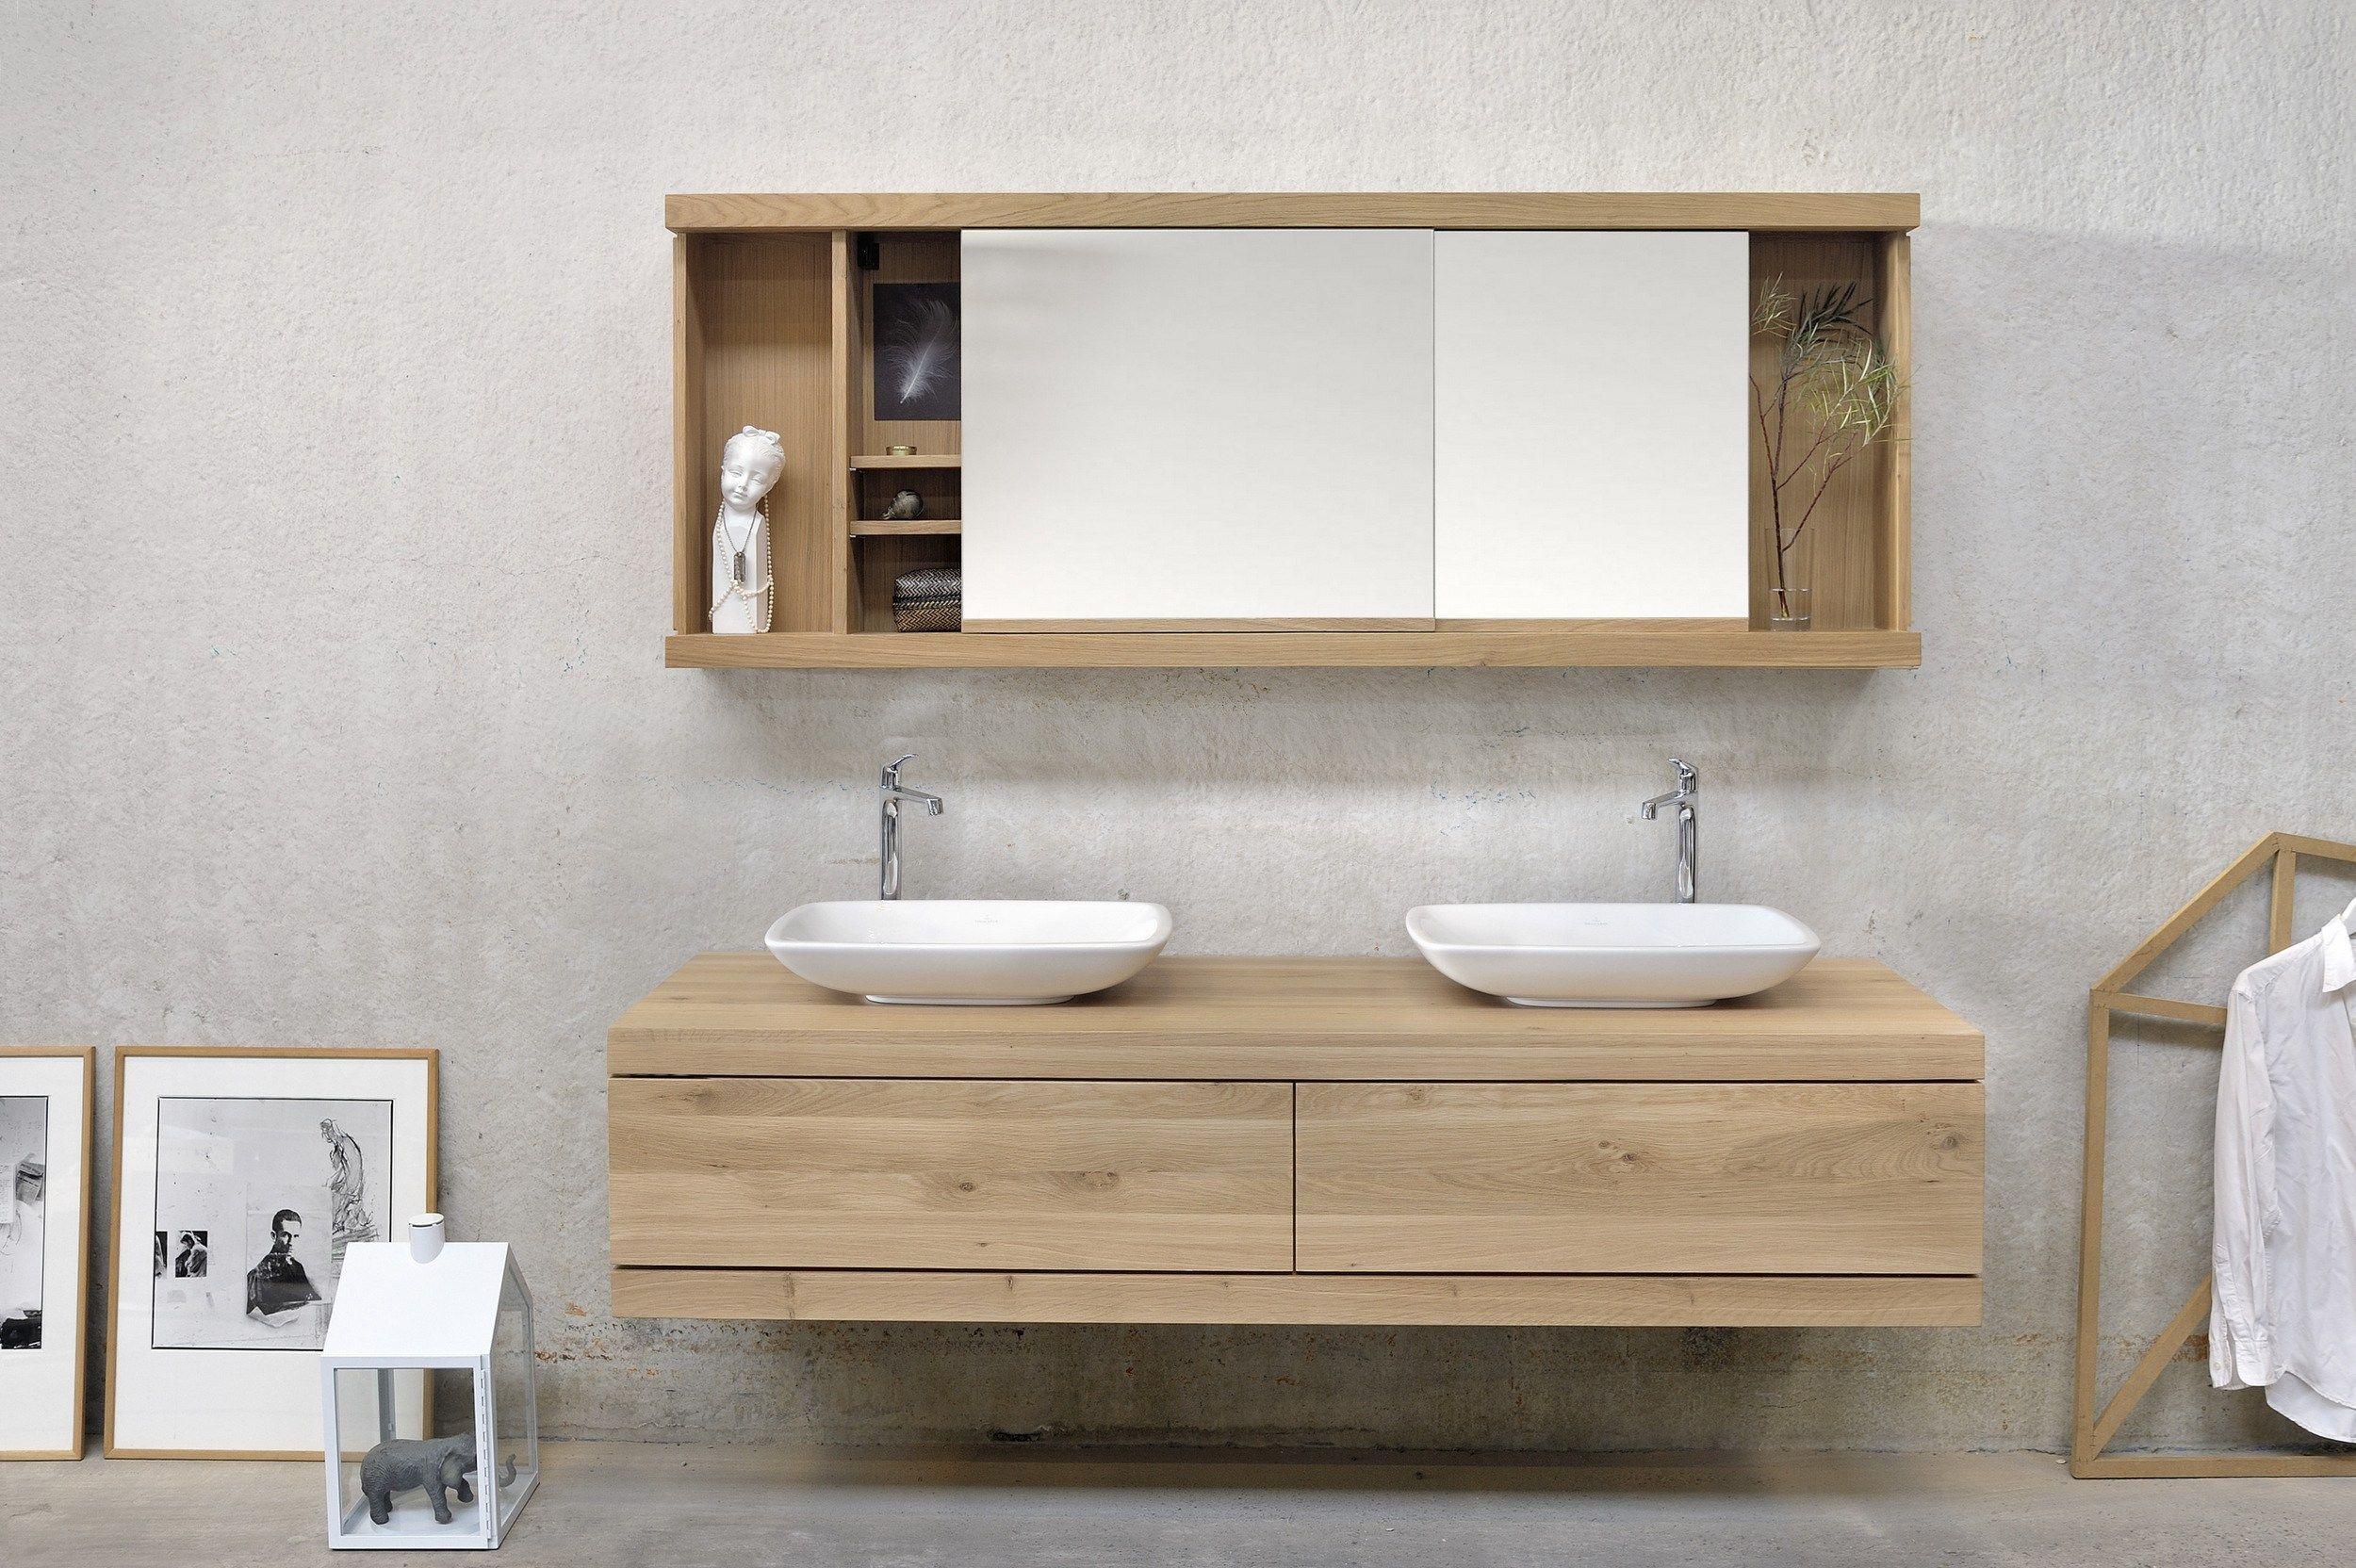 oak cadence double vanity unit by ethnicraft. Black Bedroom Furniture Sets. Home Design Ideas